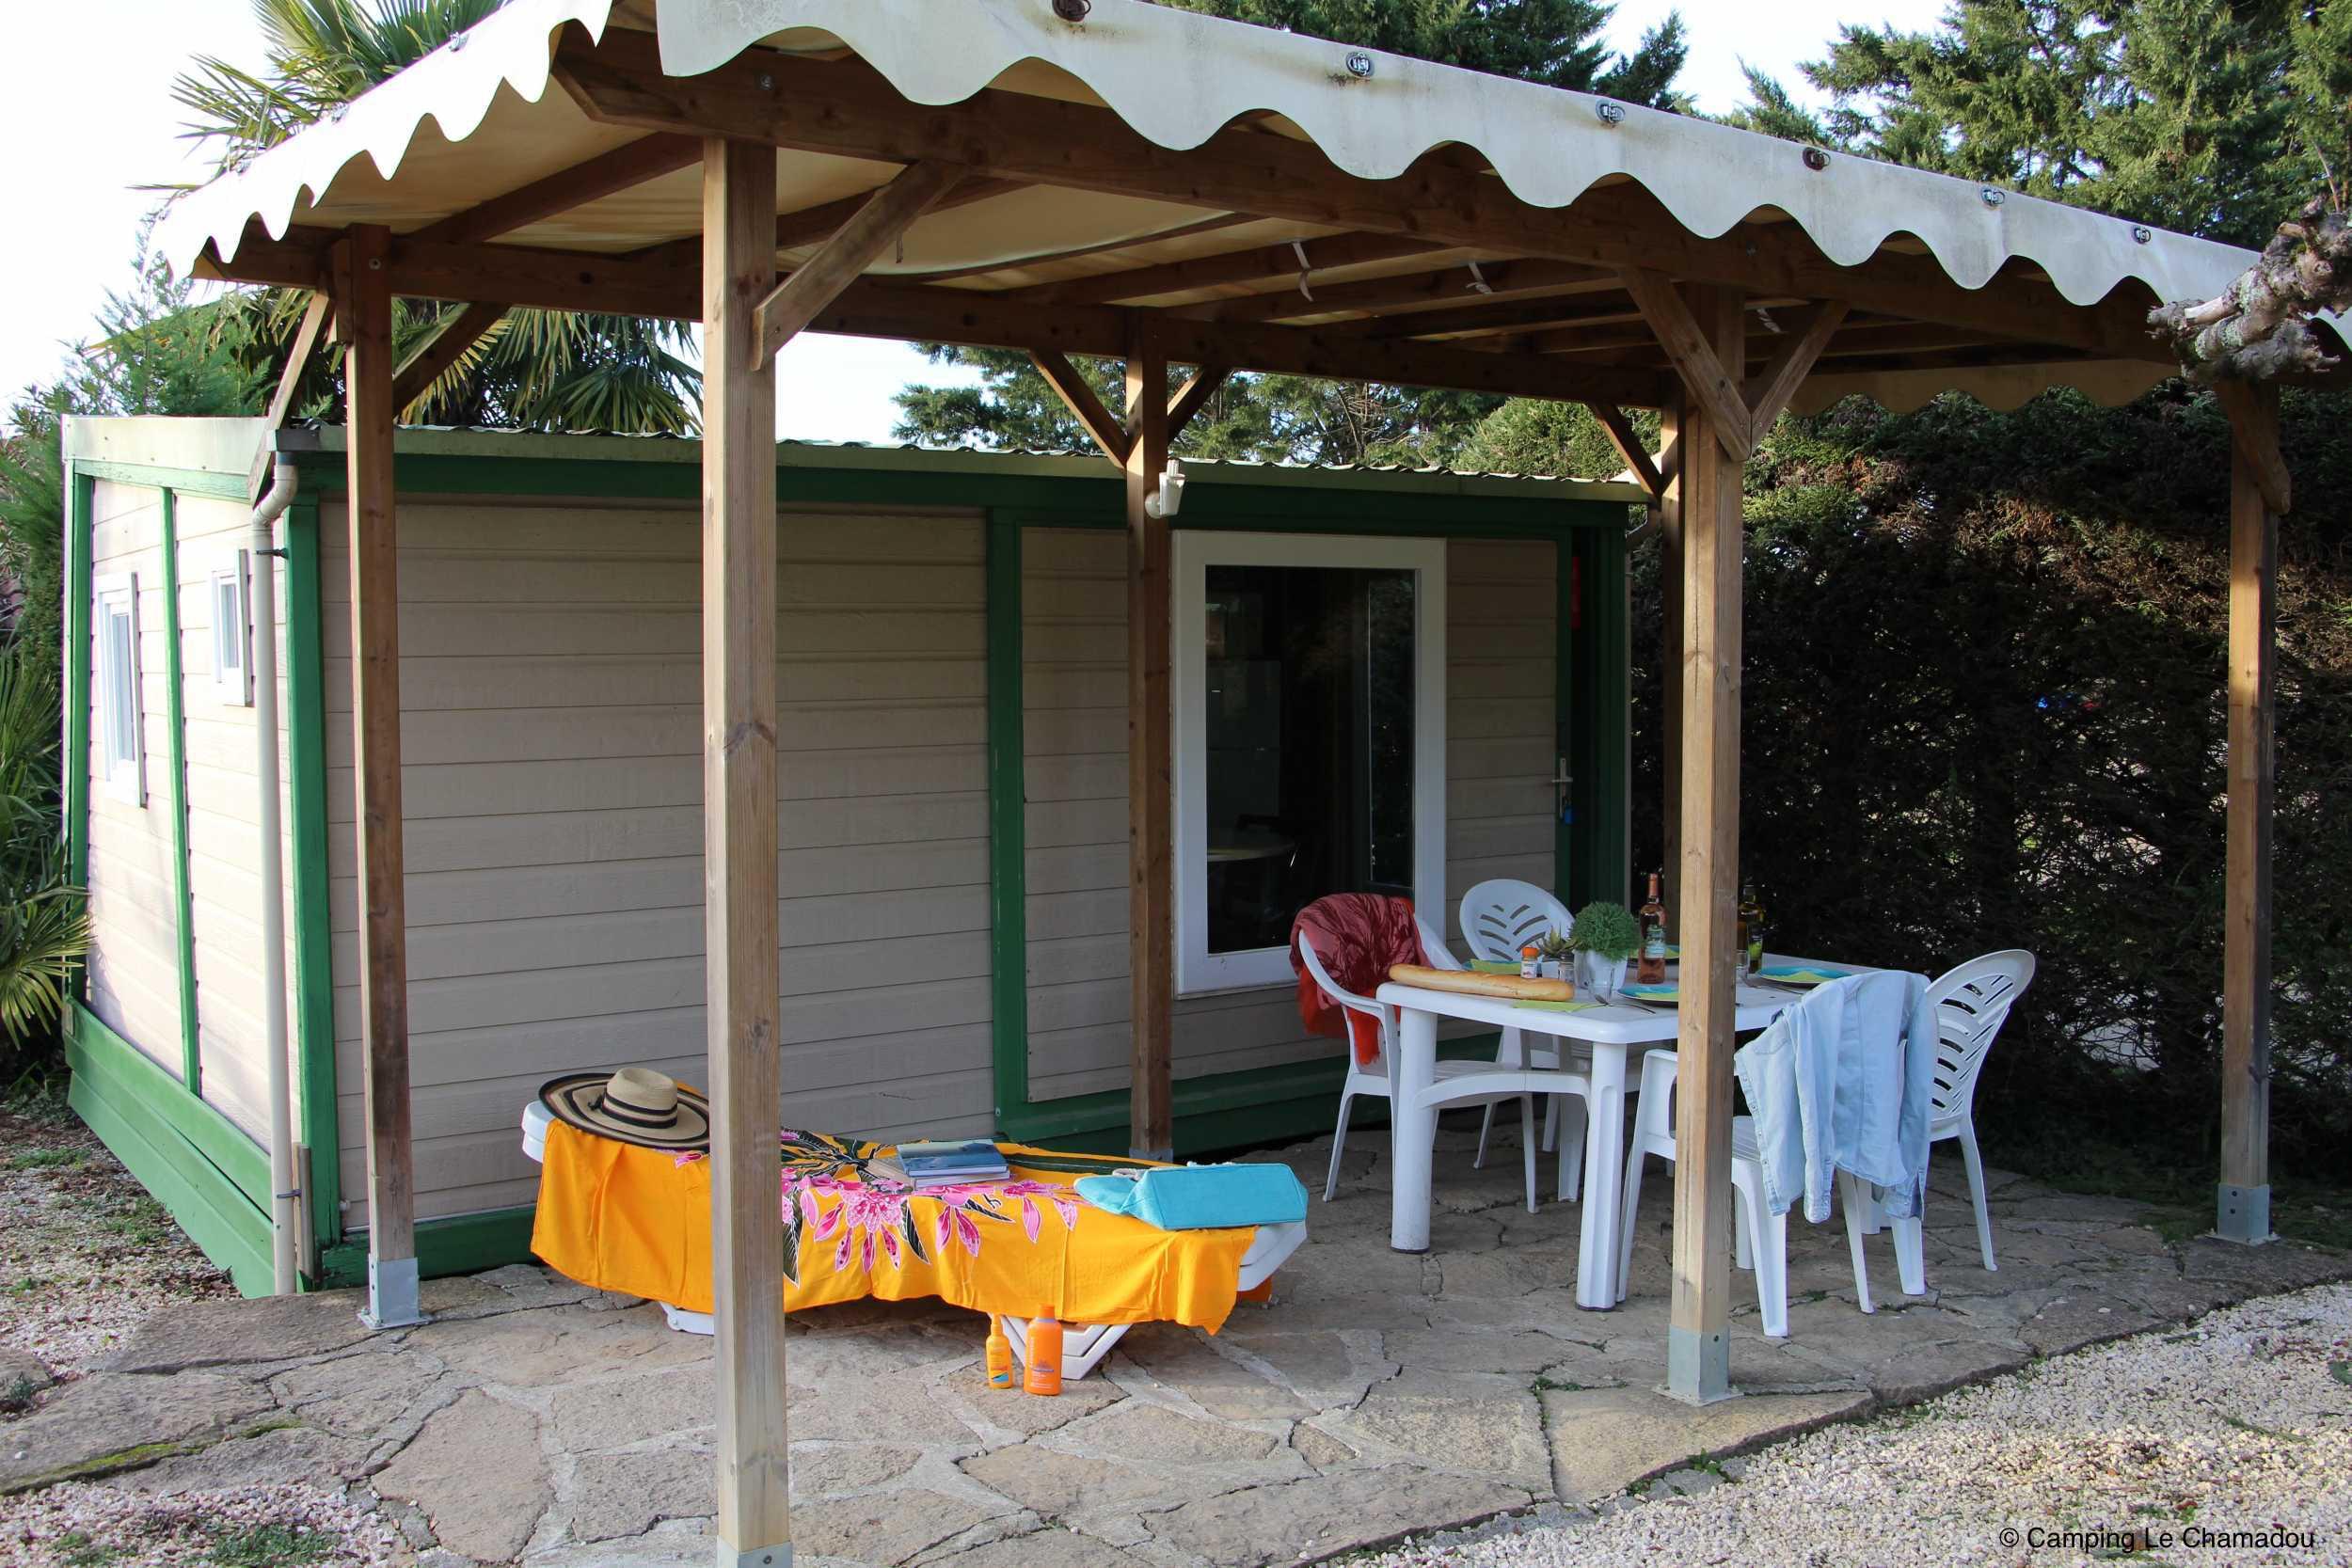 campinglechamadou-sudardeche-4etoiles-locations-mobilhomes-bonzai5.jpg